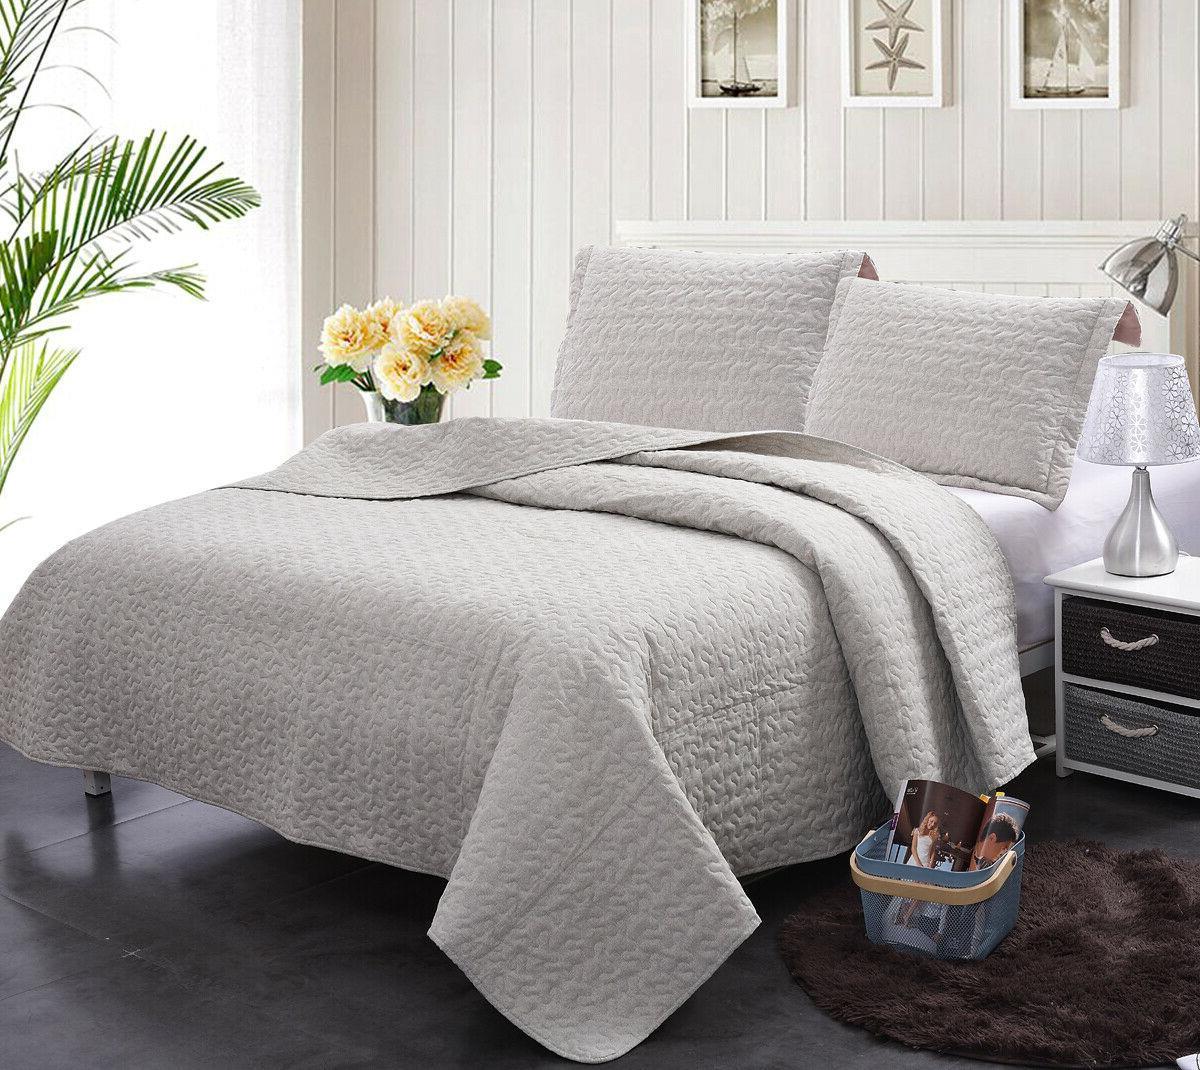 3pcs Geometric Set, Printed Bedspread Coverlet